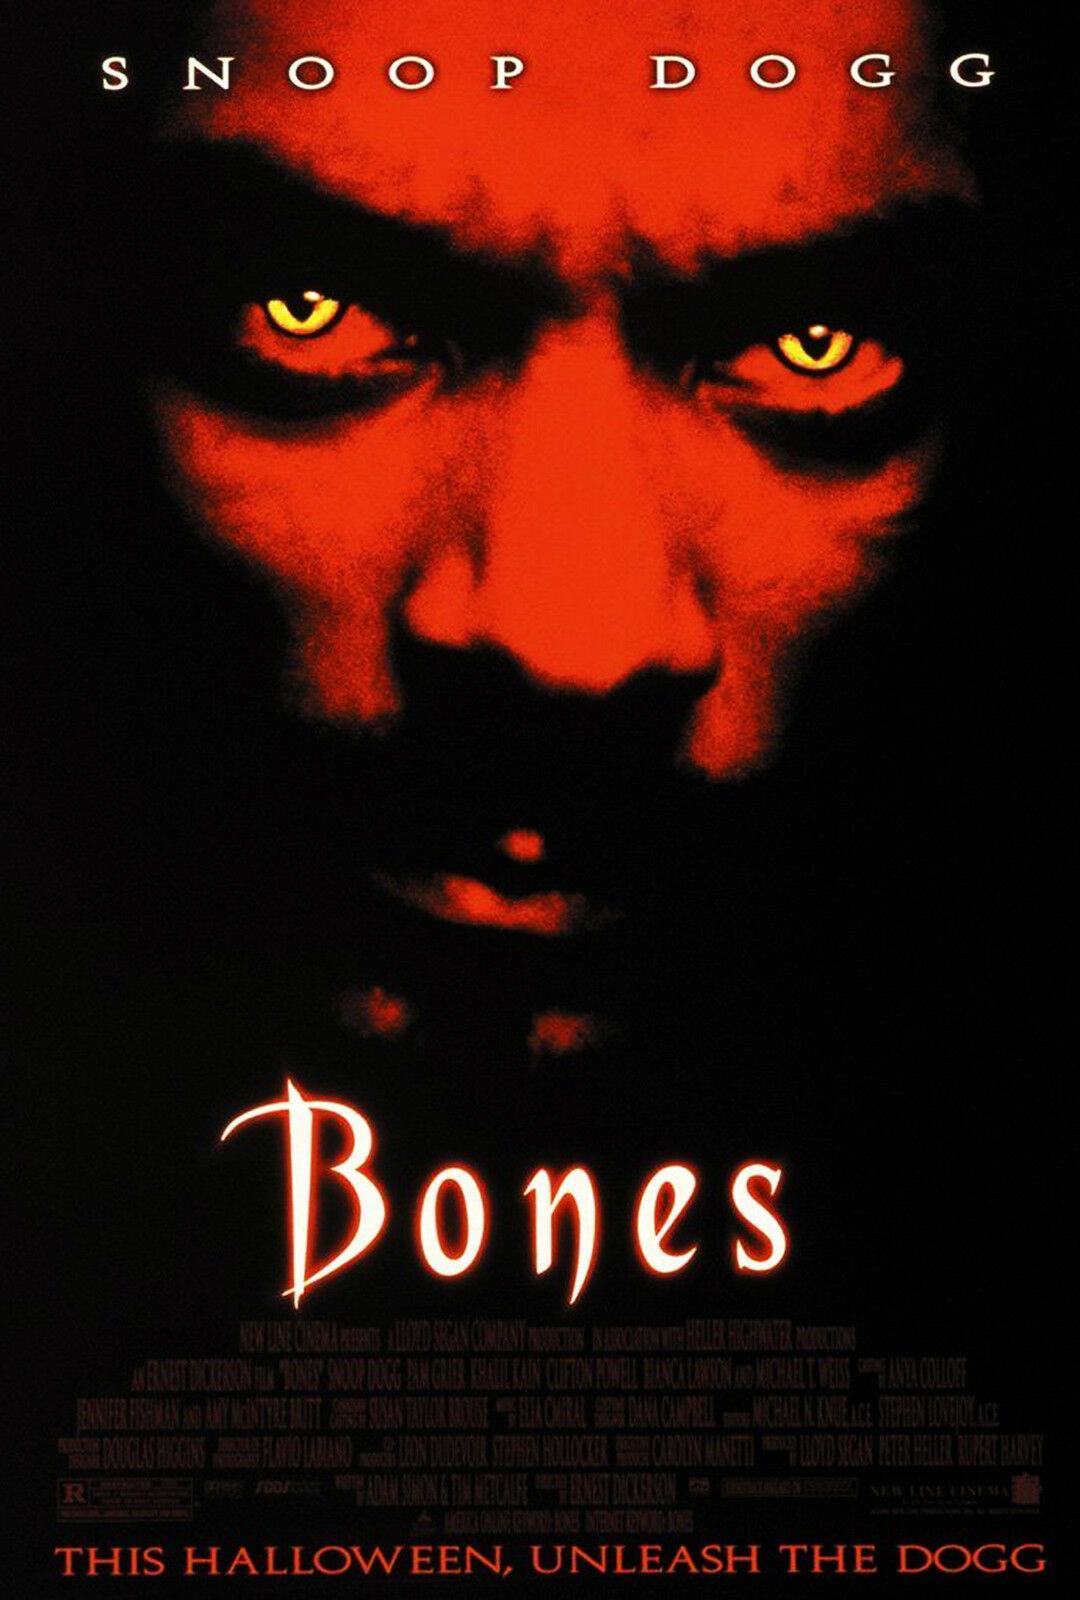 Download Filme Bone Torrent 2021 Qualidade Hd